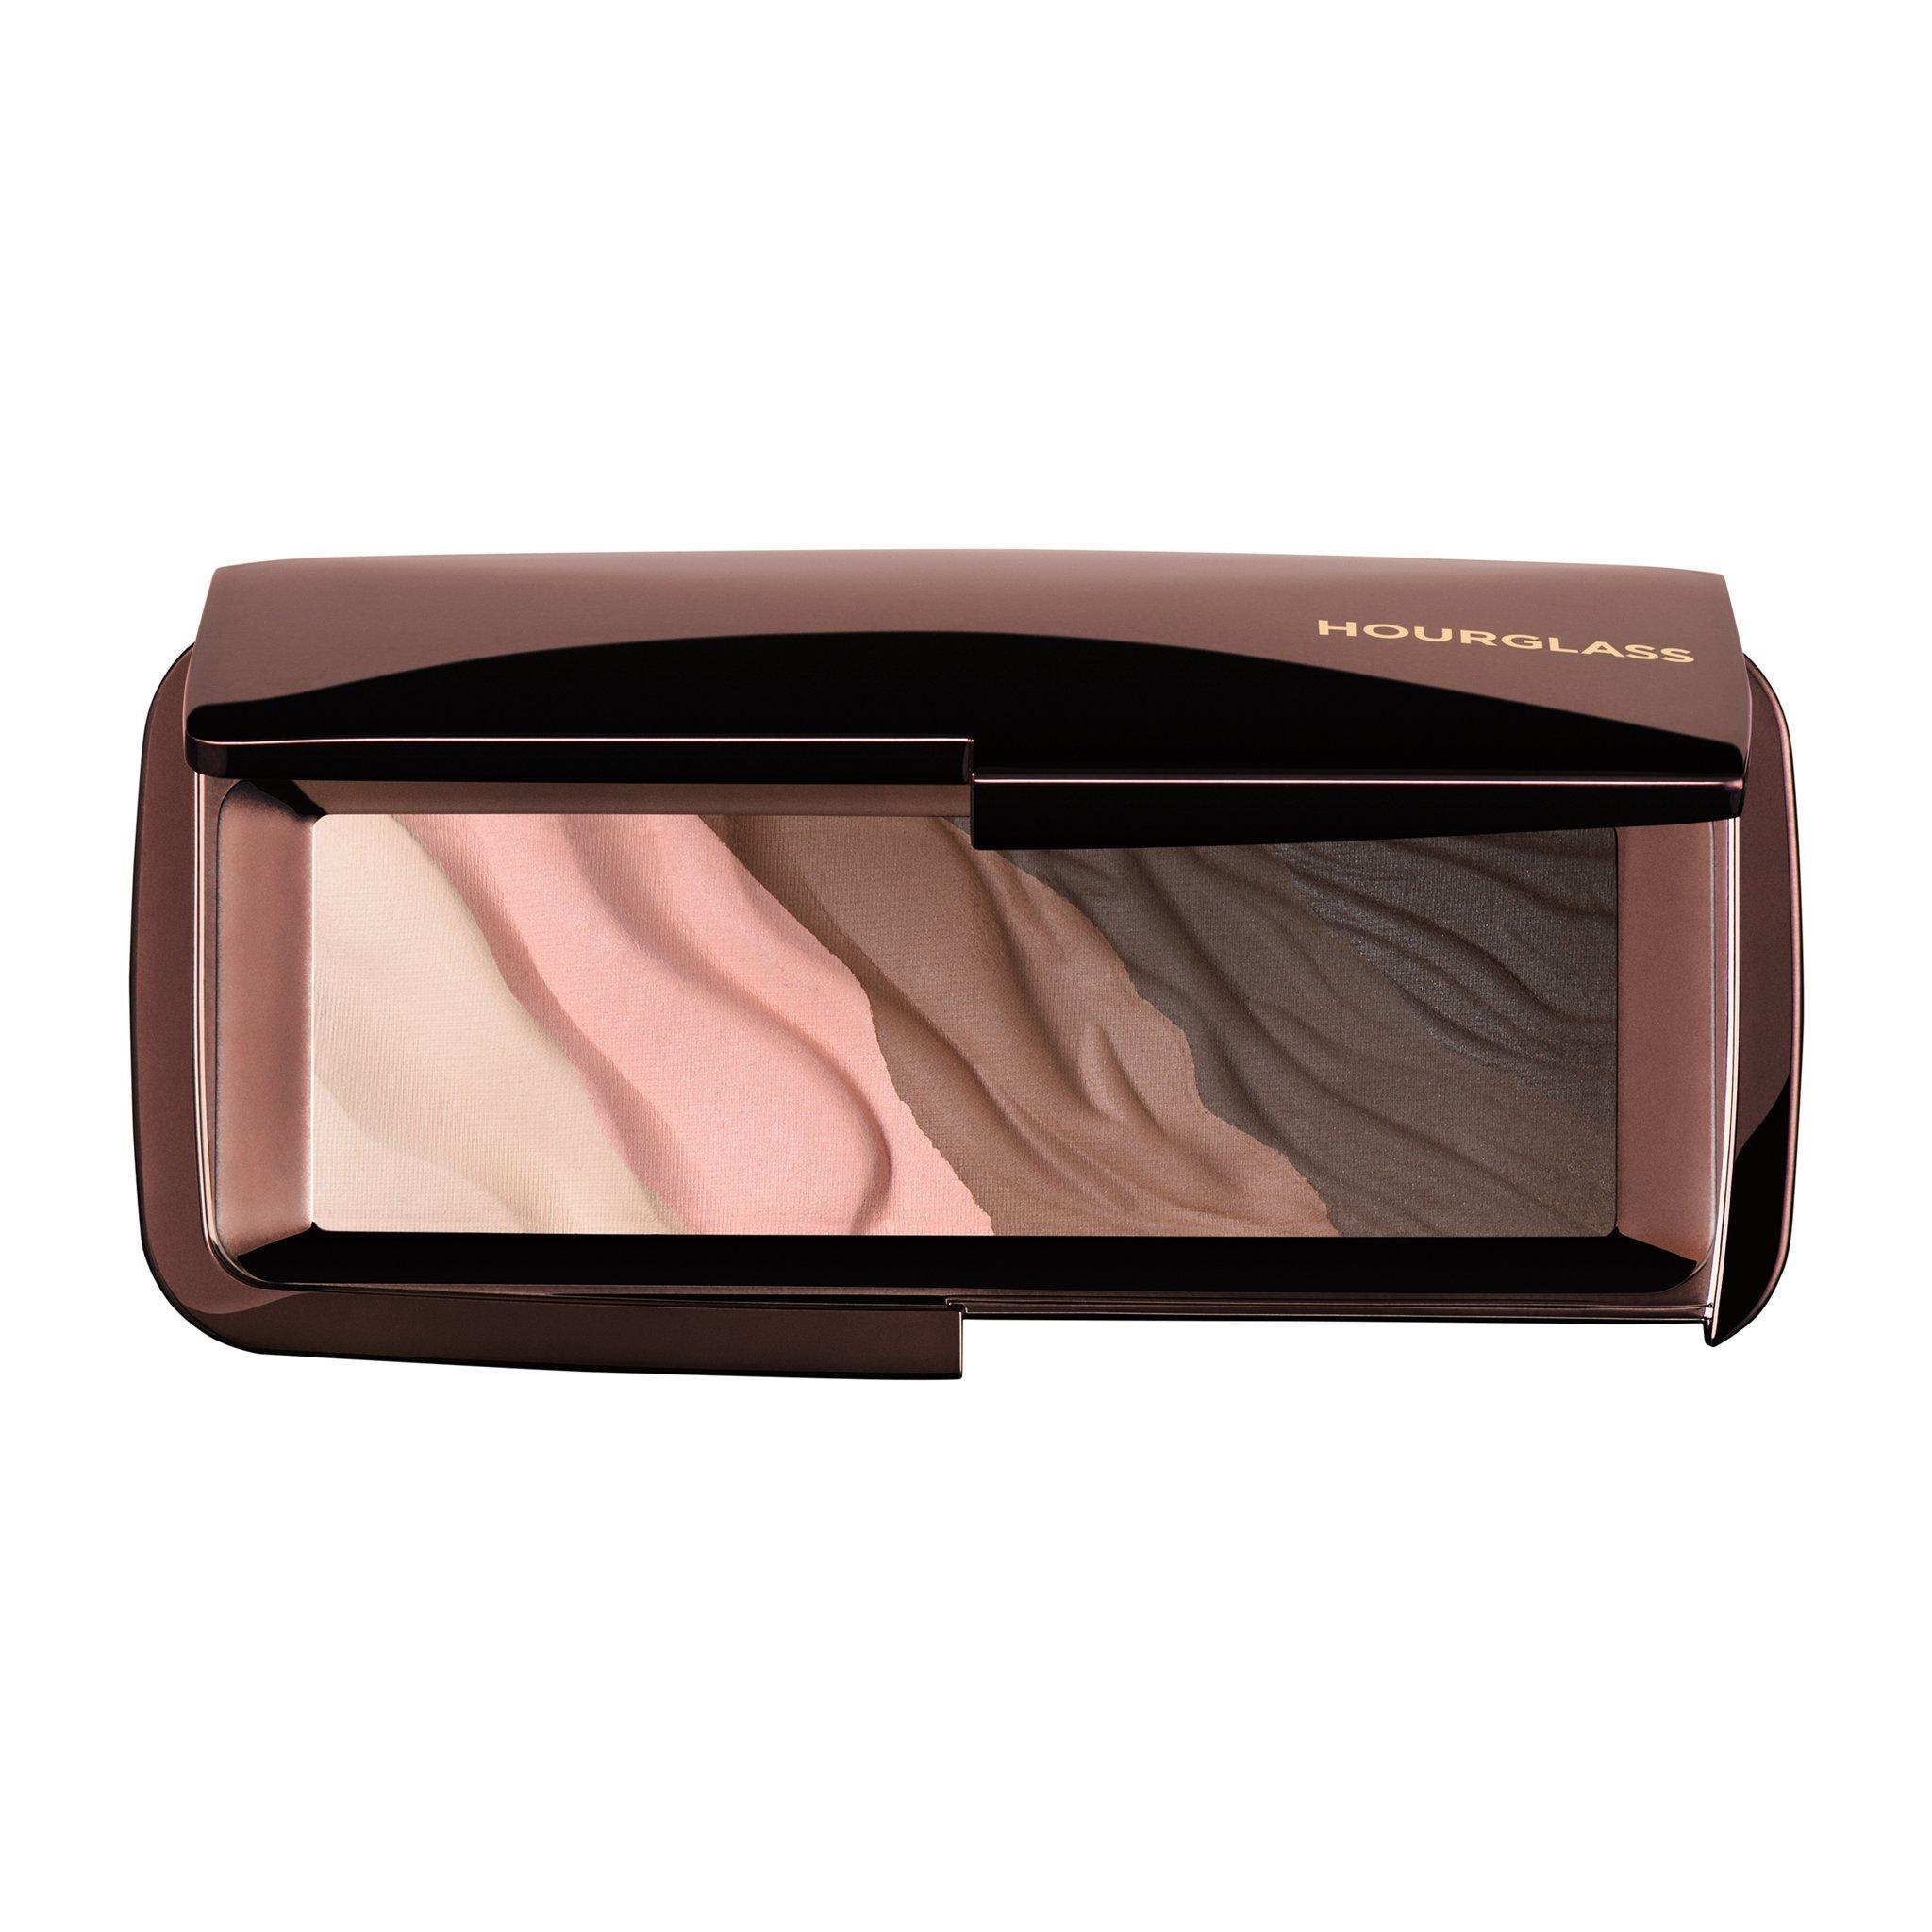 Hourglass Modernist Eyeshadow Palette- Atmosphere (Cool Neutrals)